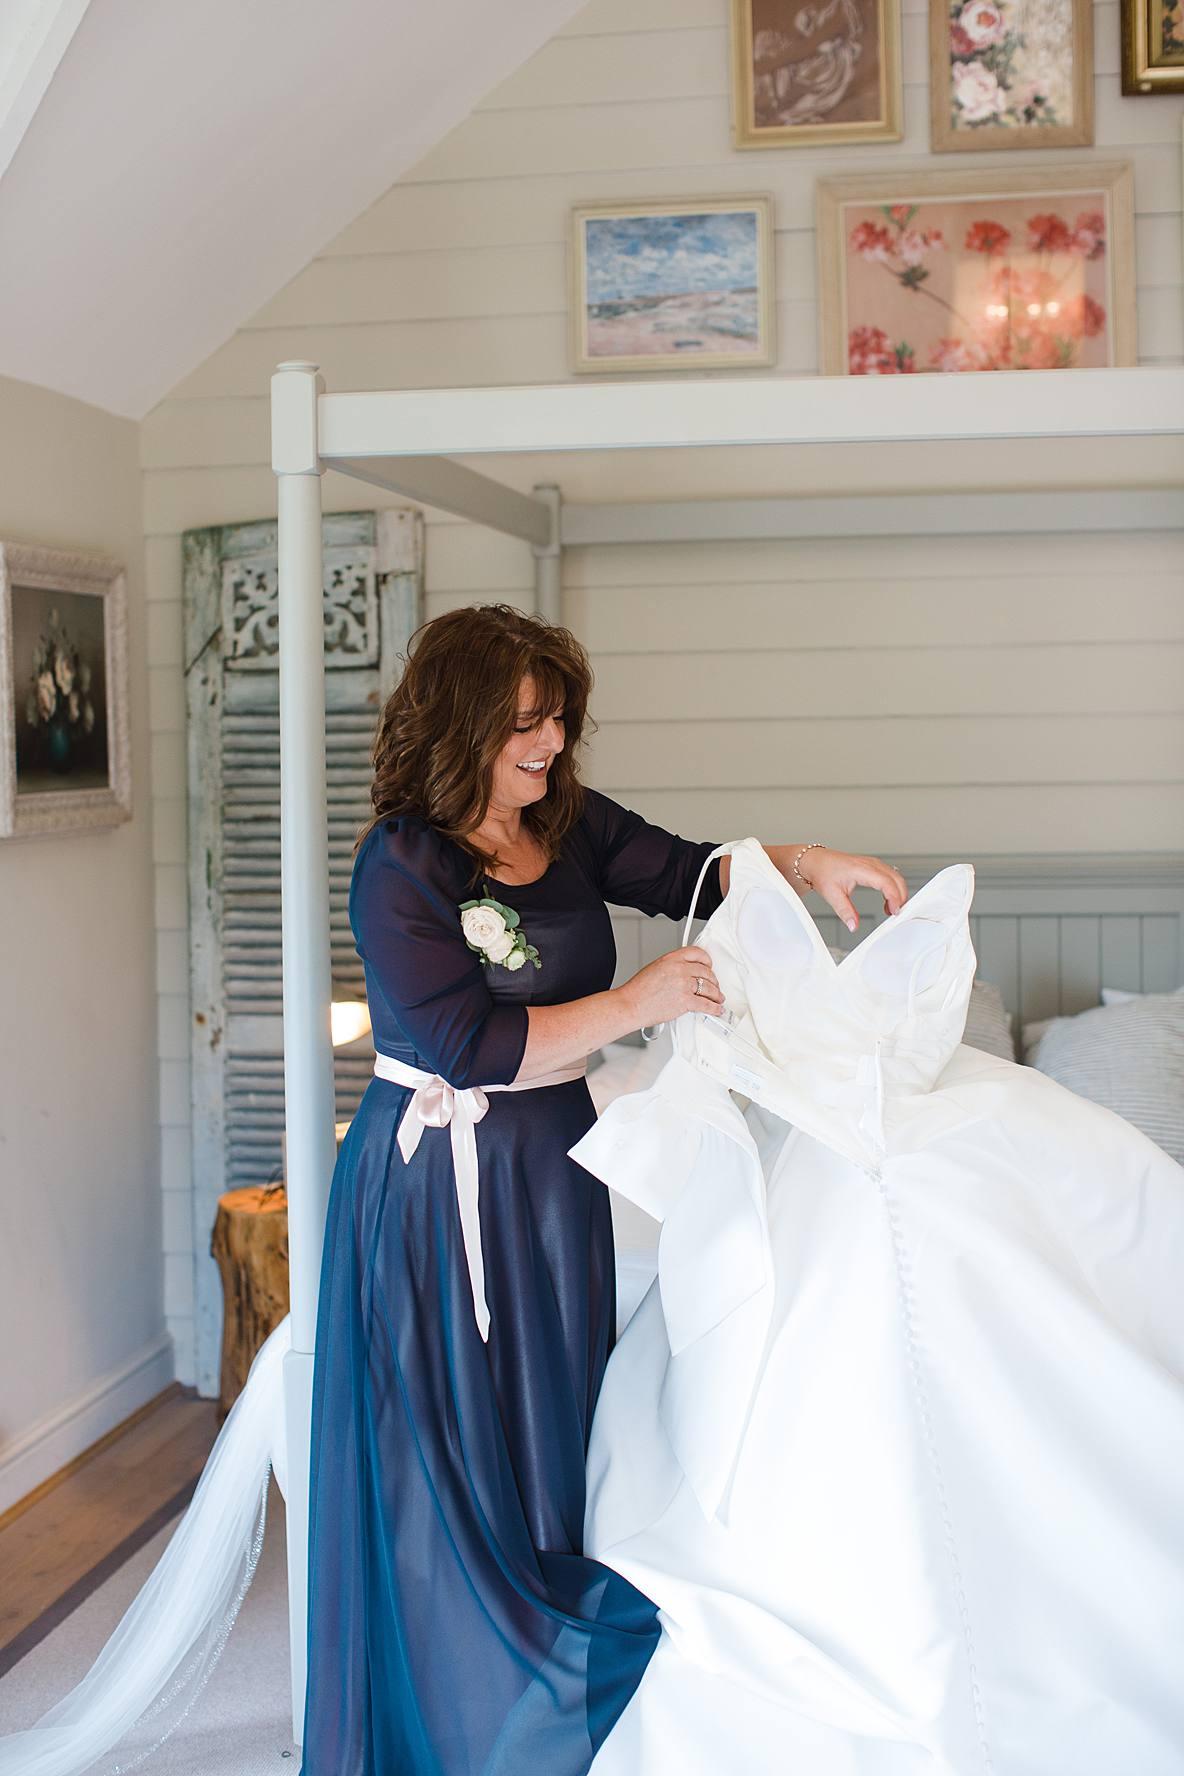 mother preparing wedding dress